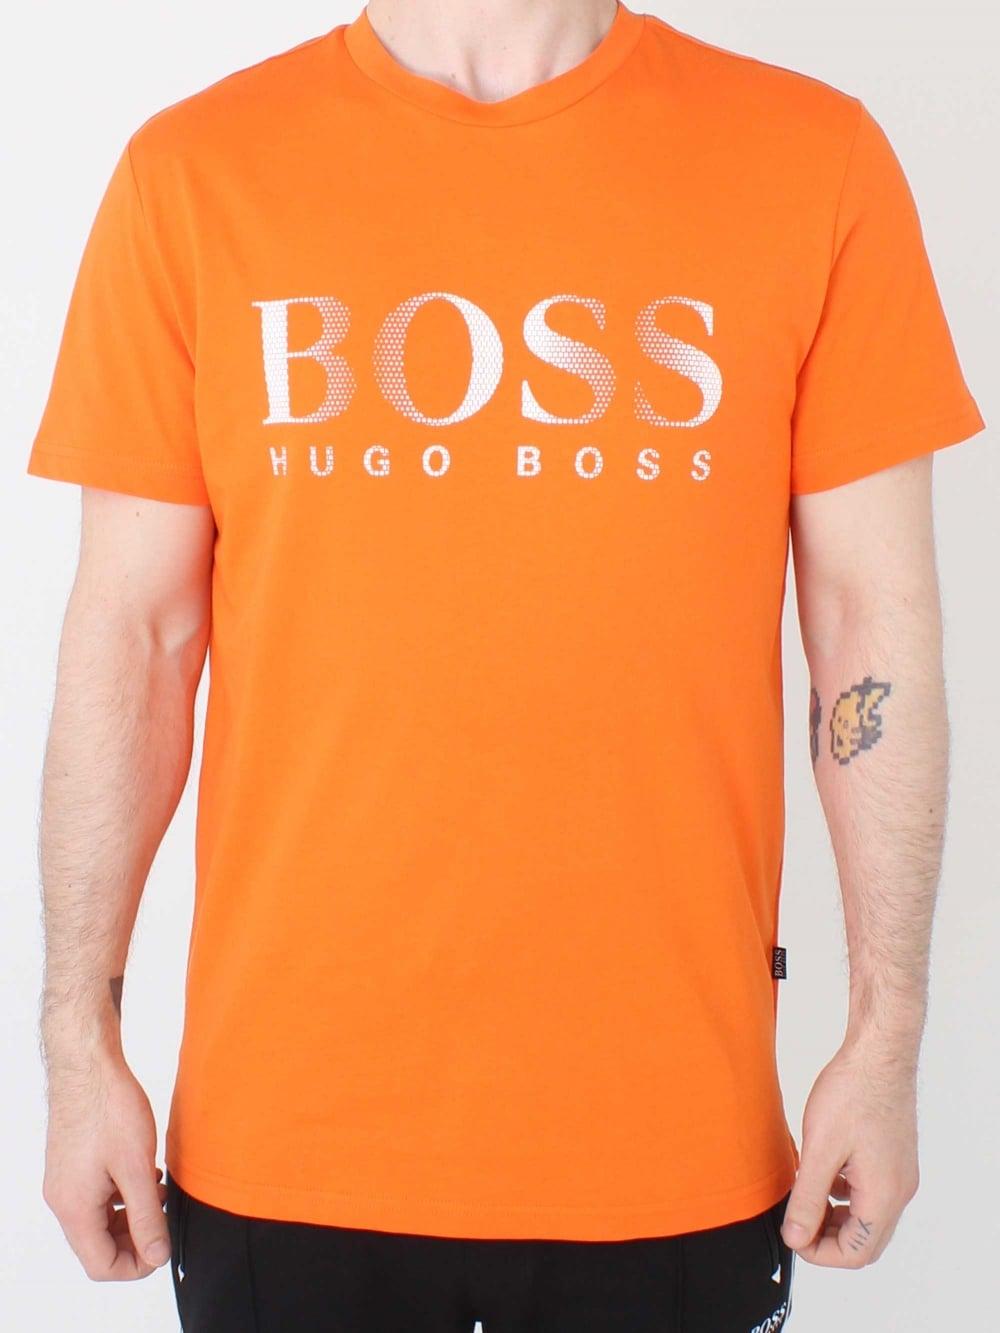 7e6c8f8c3 Hugo Boss Regular Fit UV Logo T.Shirt in Orange | Northern Threads